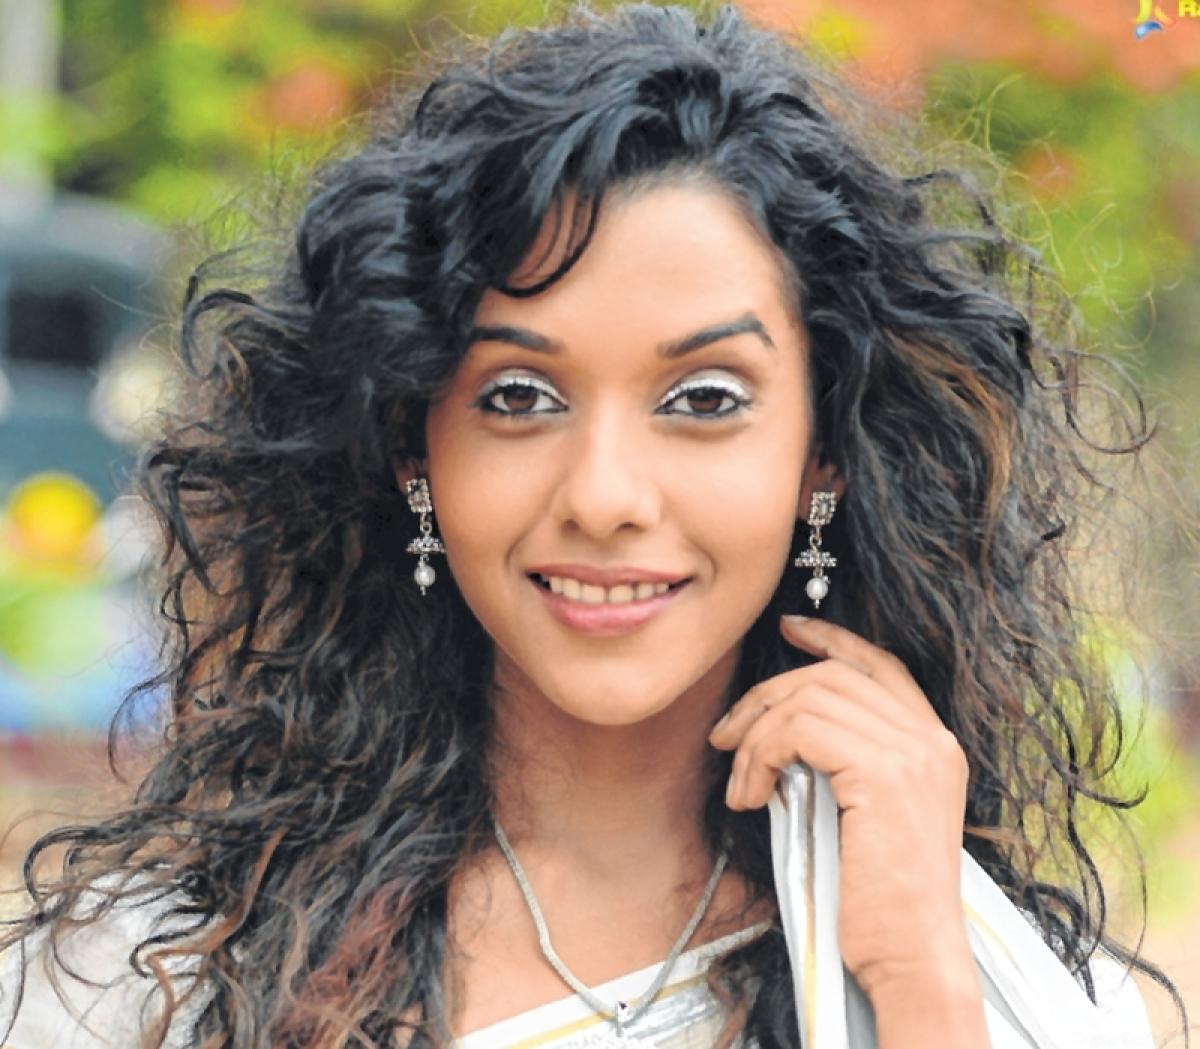 Fuh se Fantasy is different concept, says Anupriya Goenka